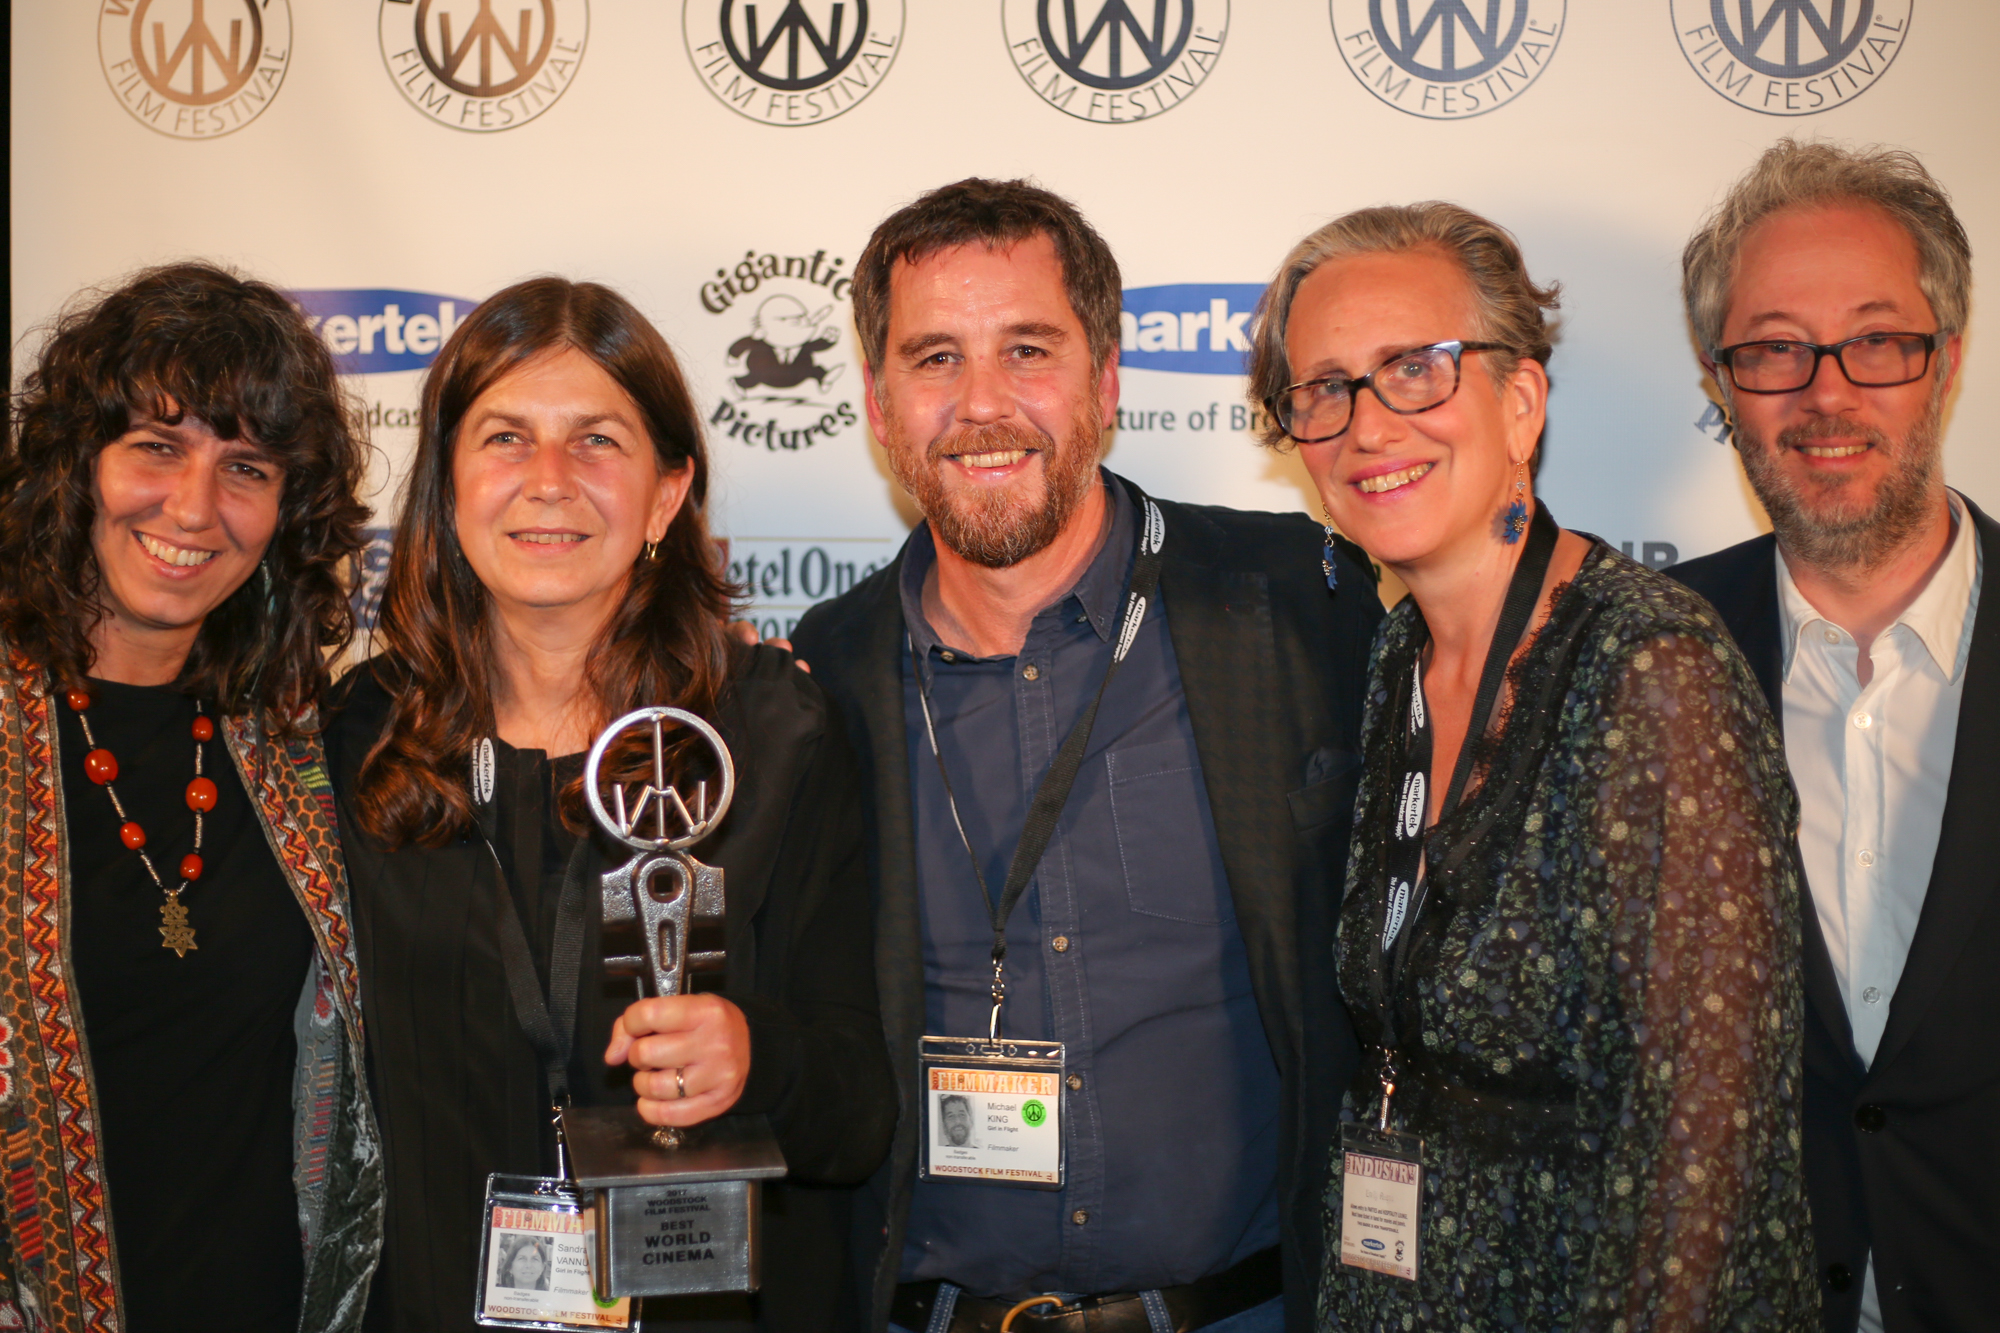 The jurors with Michael King and Sandra Vannucchi, GIRL IN FLIGHT winner of the World Cinema Award at the 2017 Woodstock Film Festival Maverick Awards